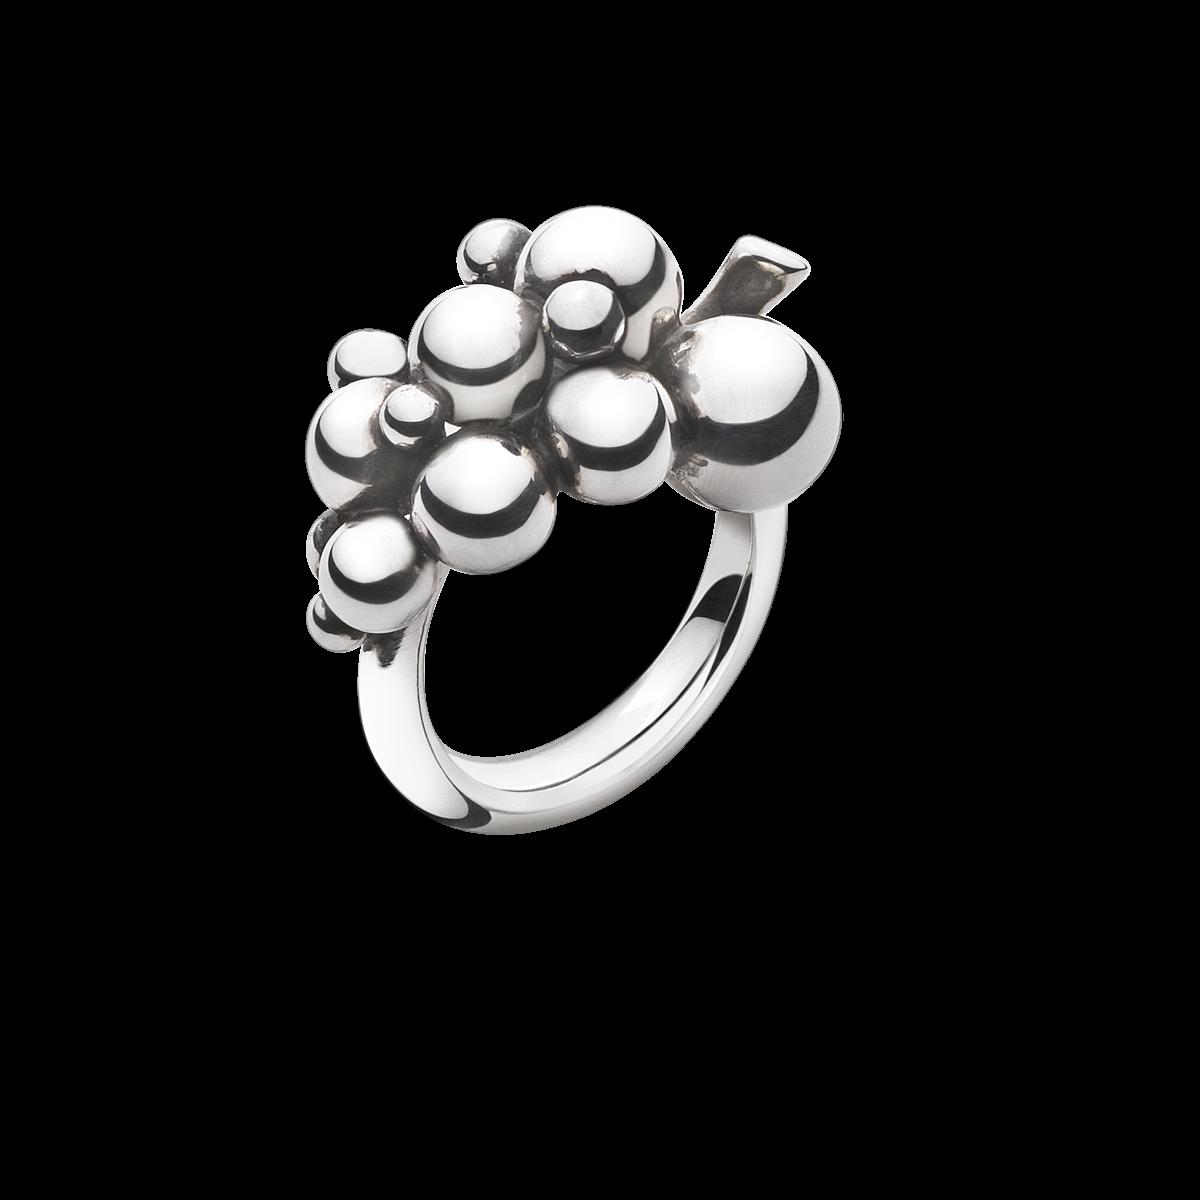 Moonlight Grapes Ring Small